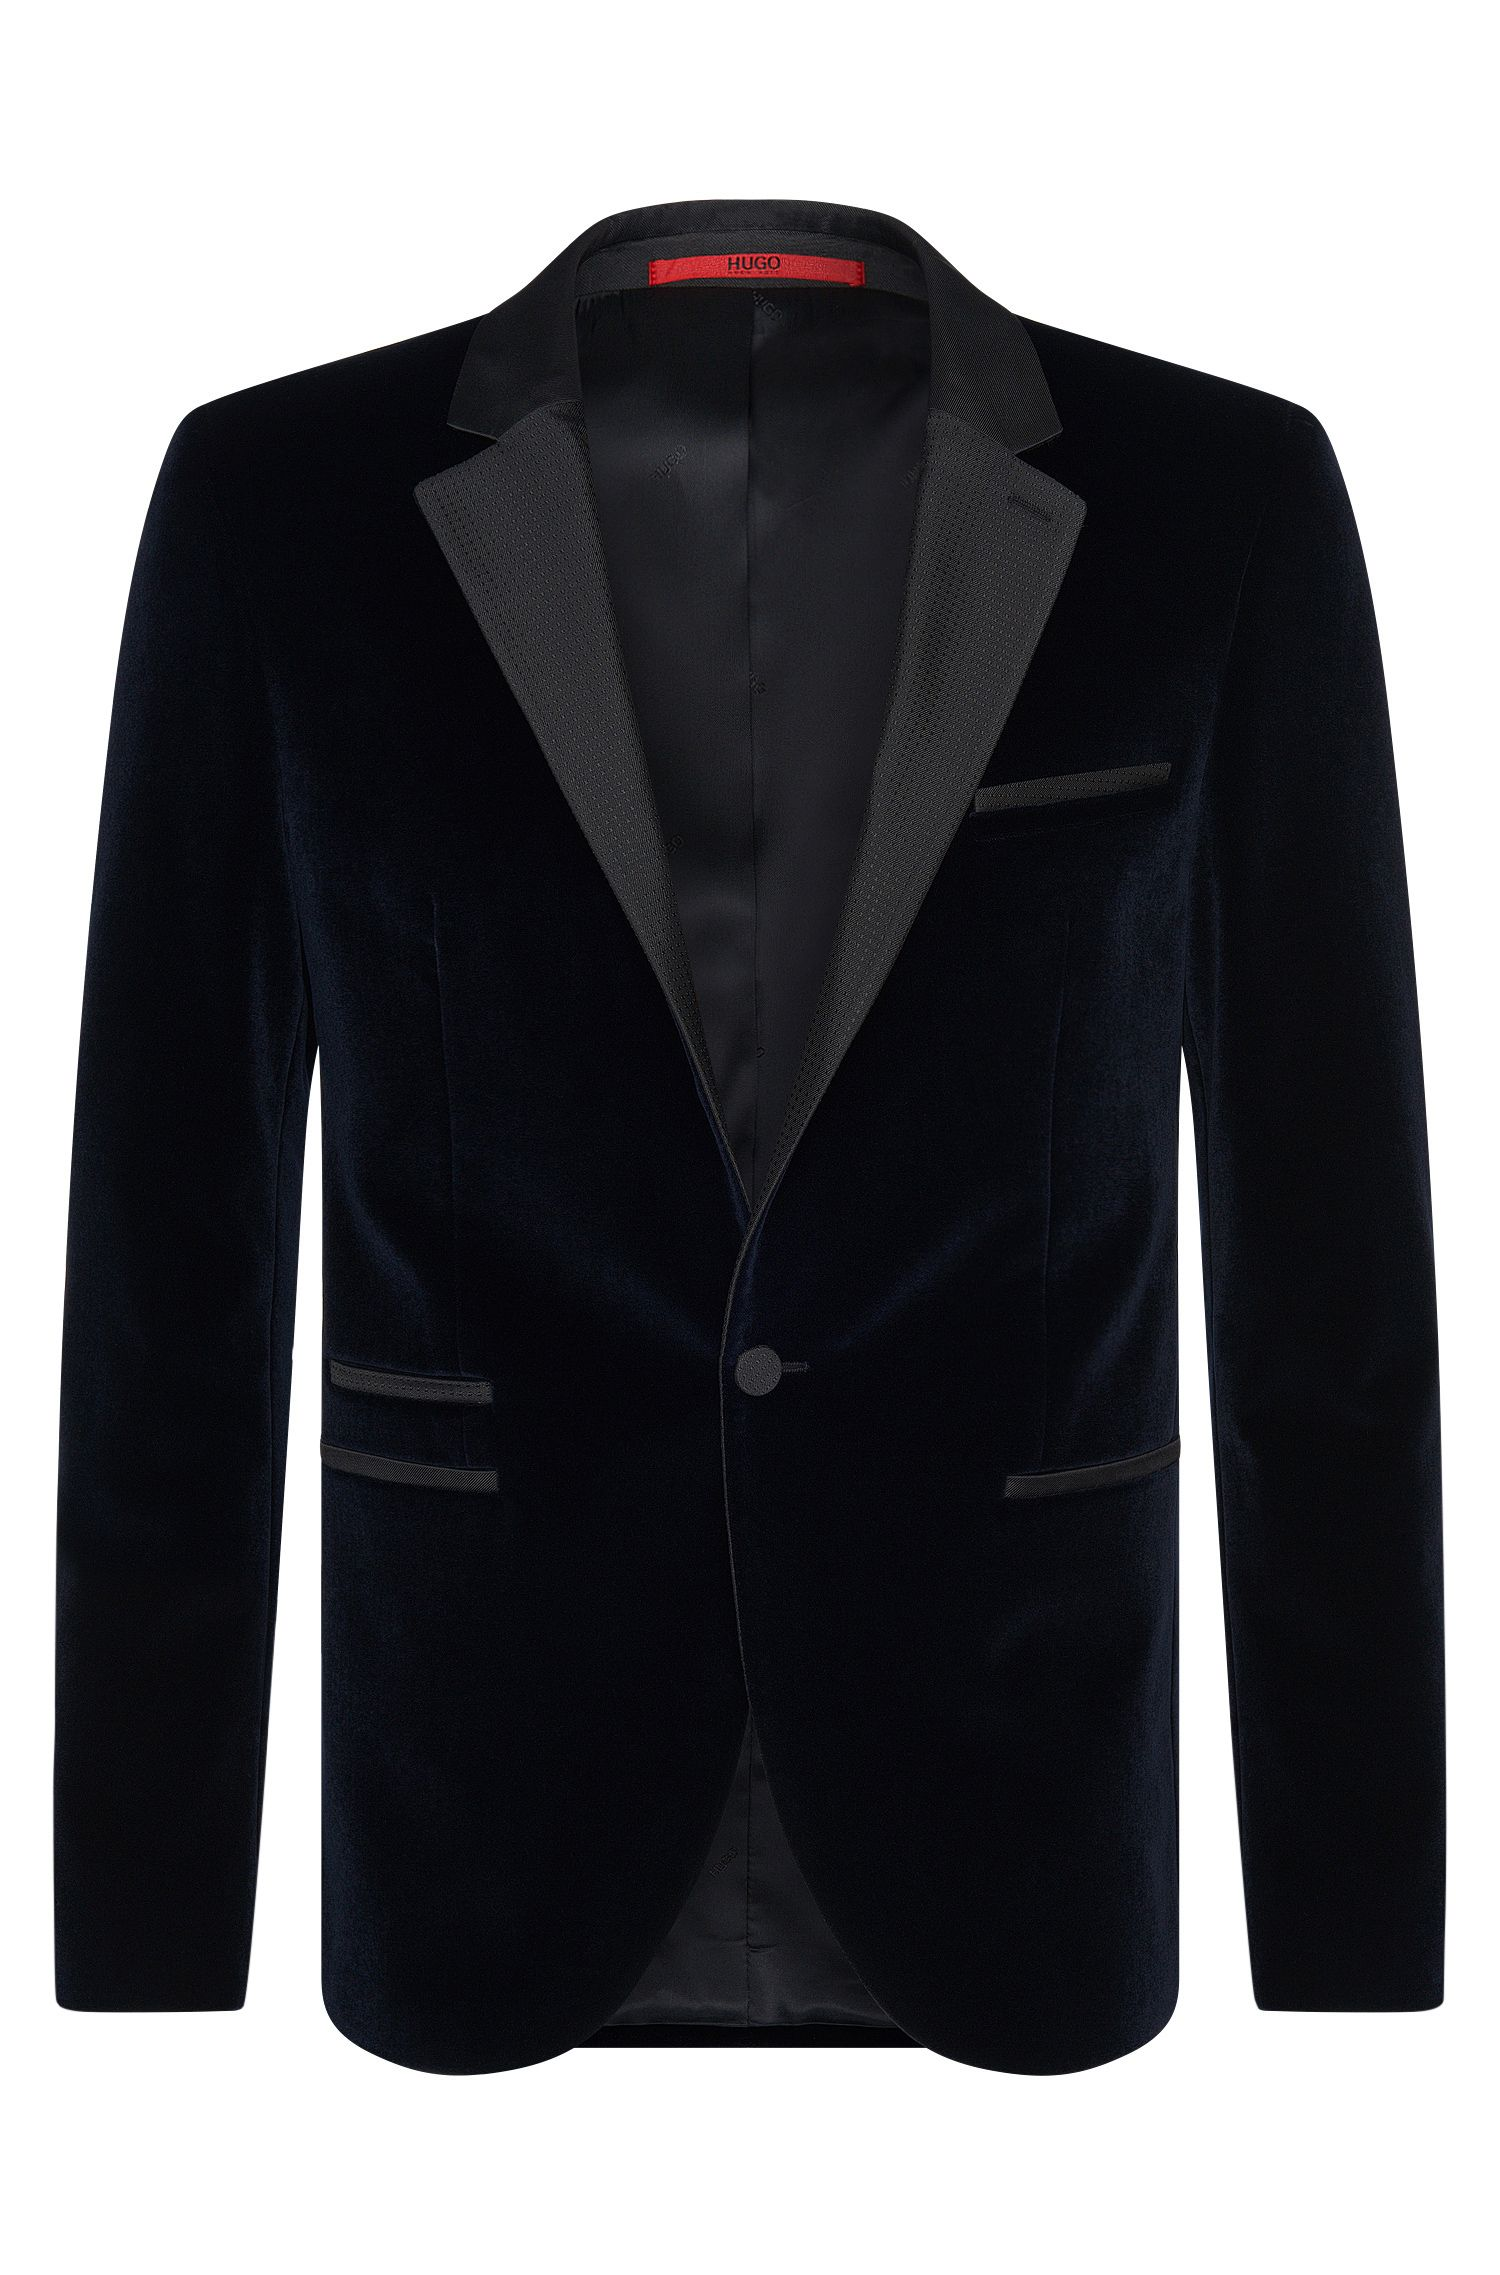 'Aliks' | Extra Slim Fit, Cotton Silk Velvet Tuxedo Jacket